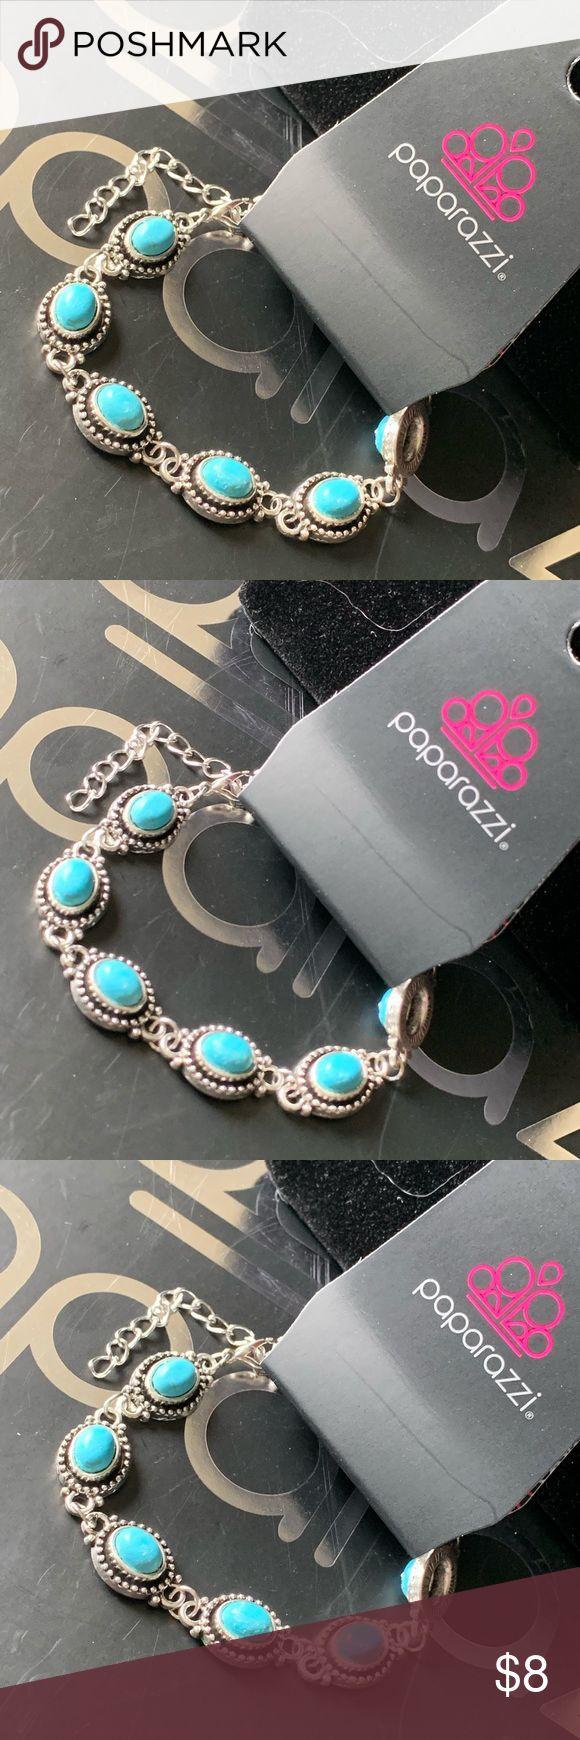 Paparazzi Bracelet Rocky Mountain Ranger Blue Bracelet